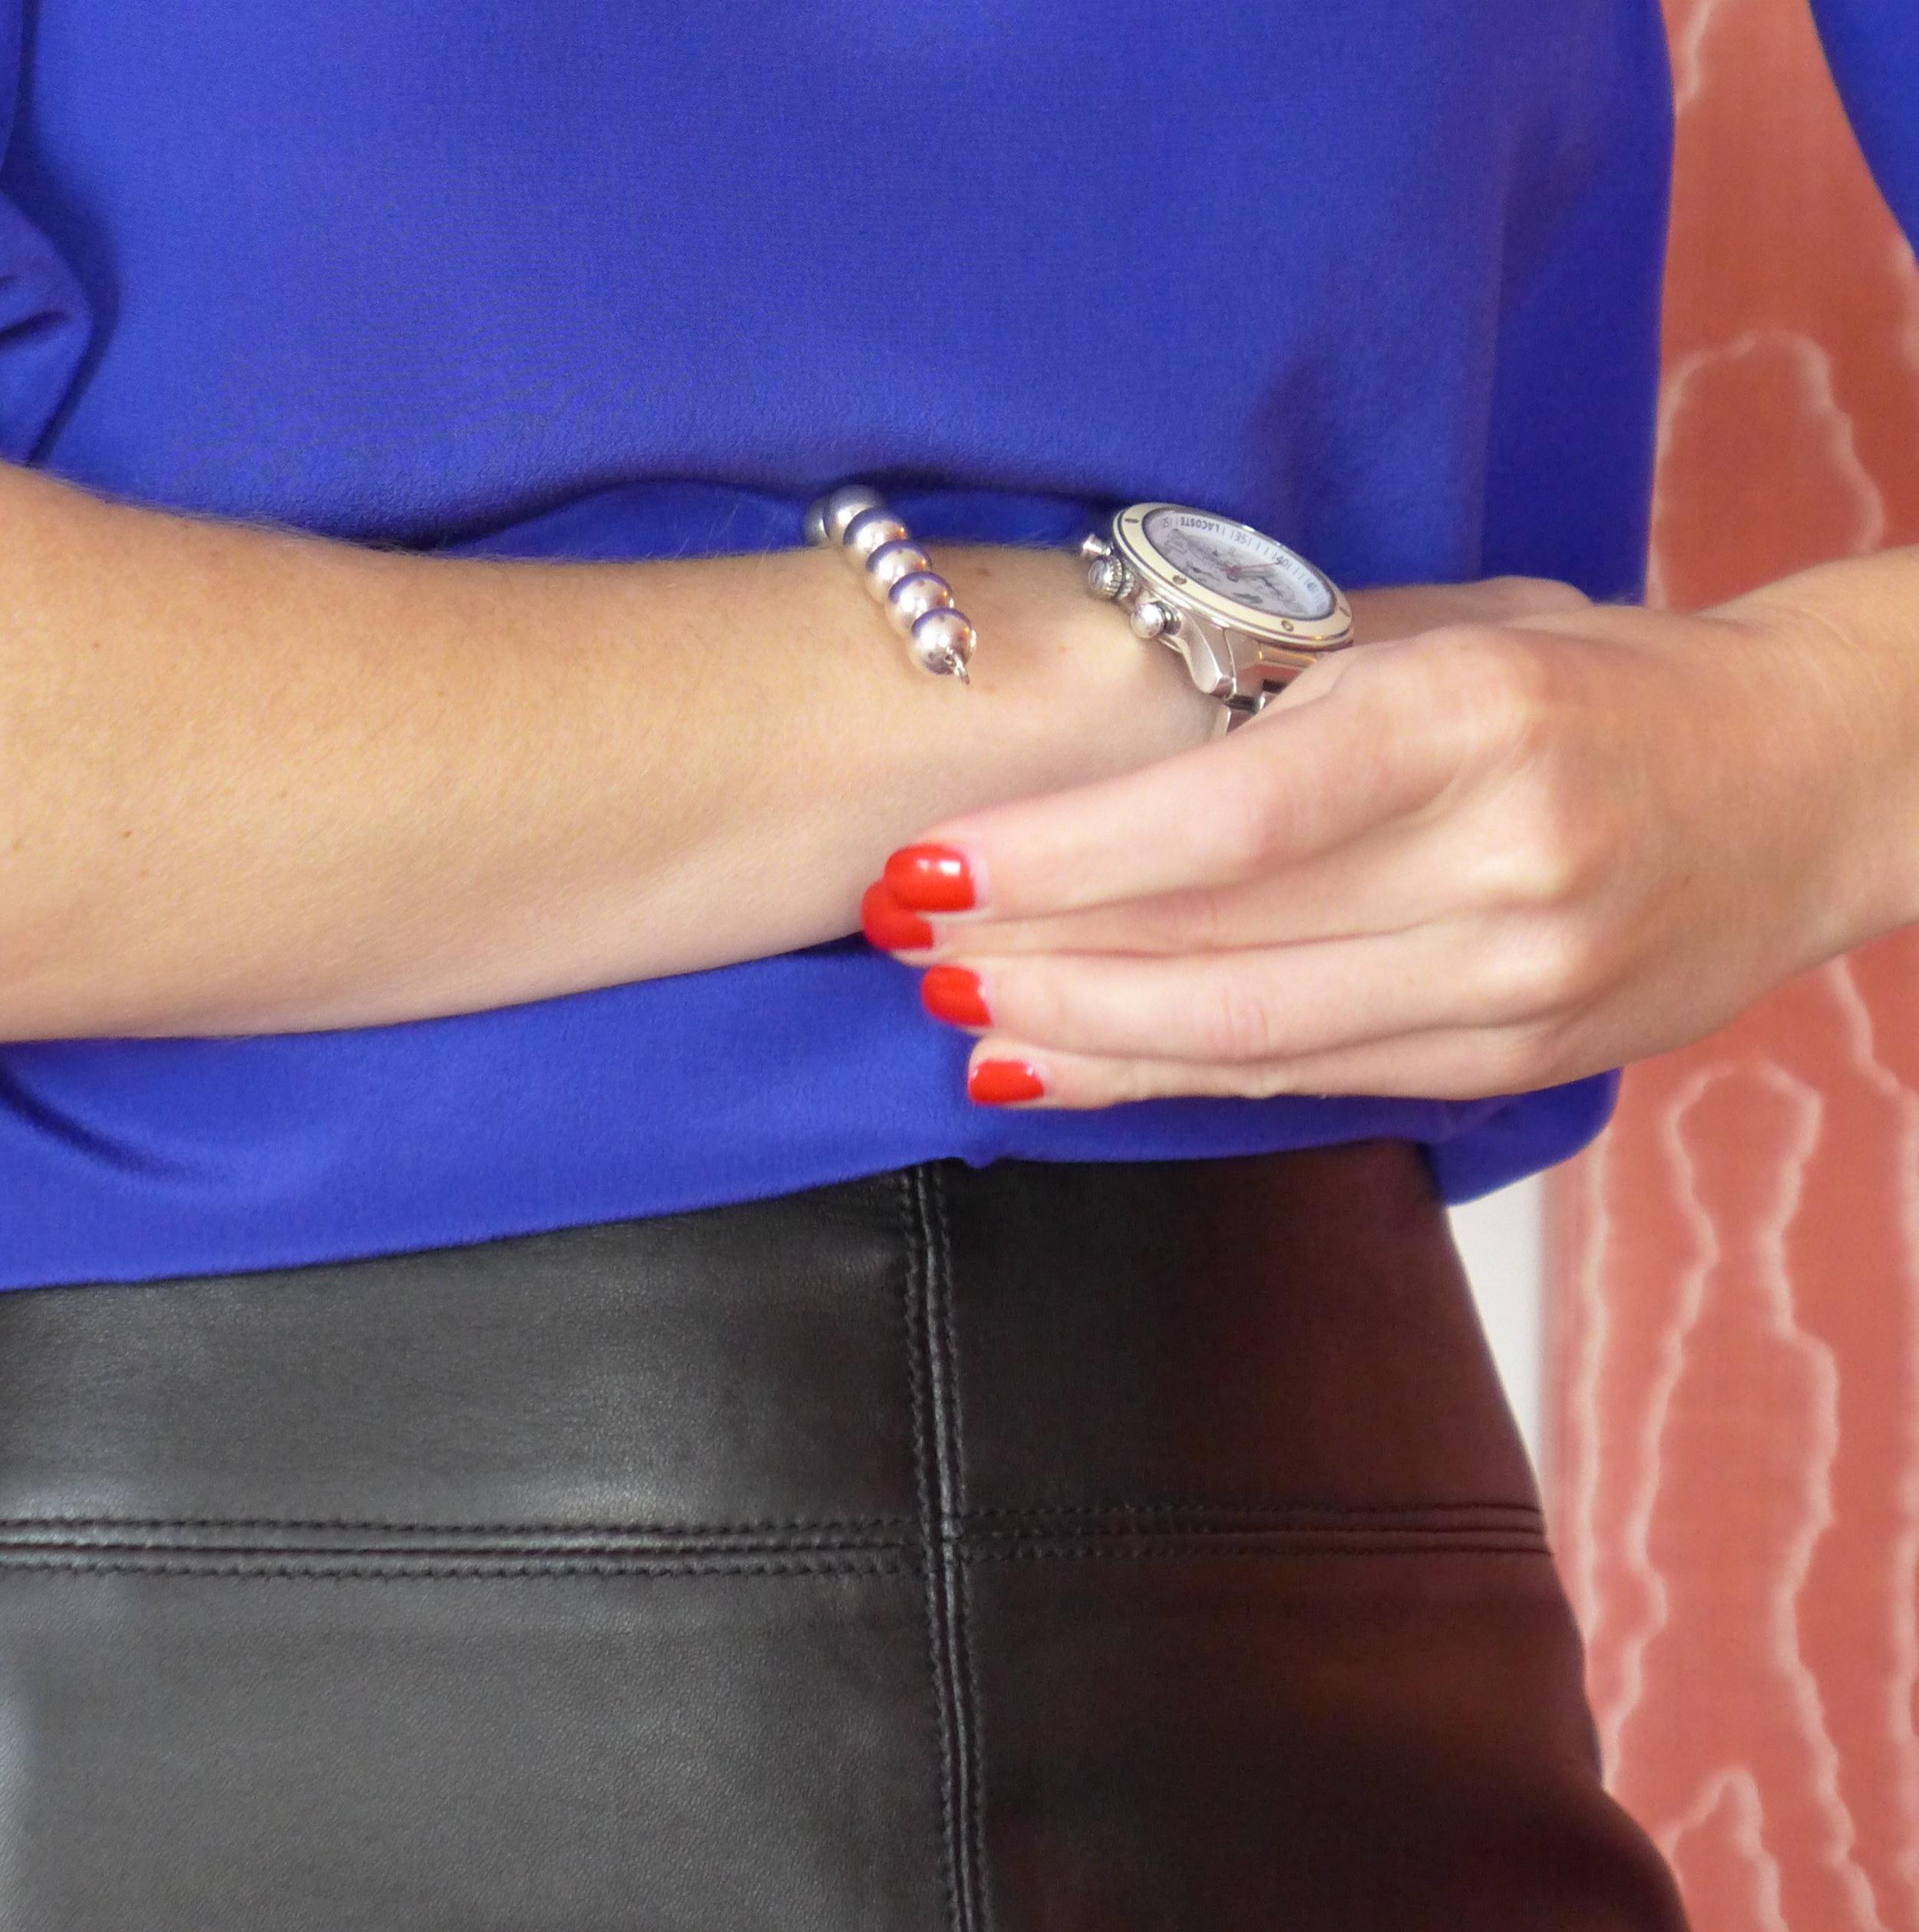 silk-blouse-and-silver-bracelet